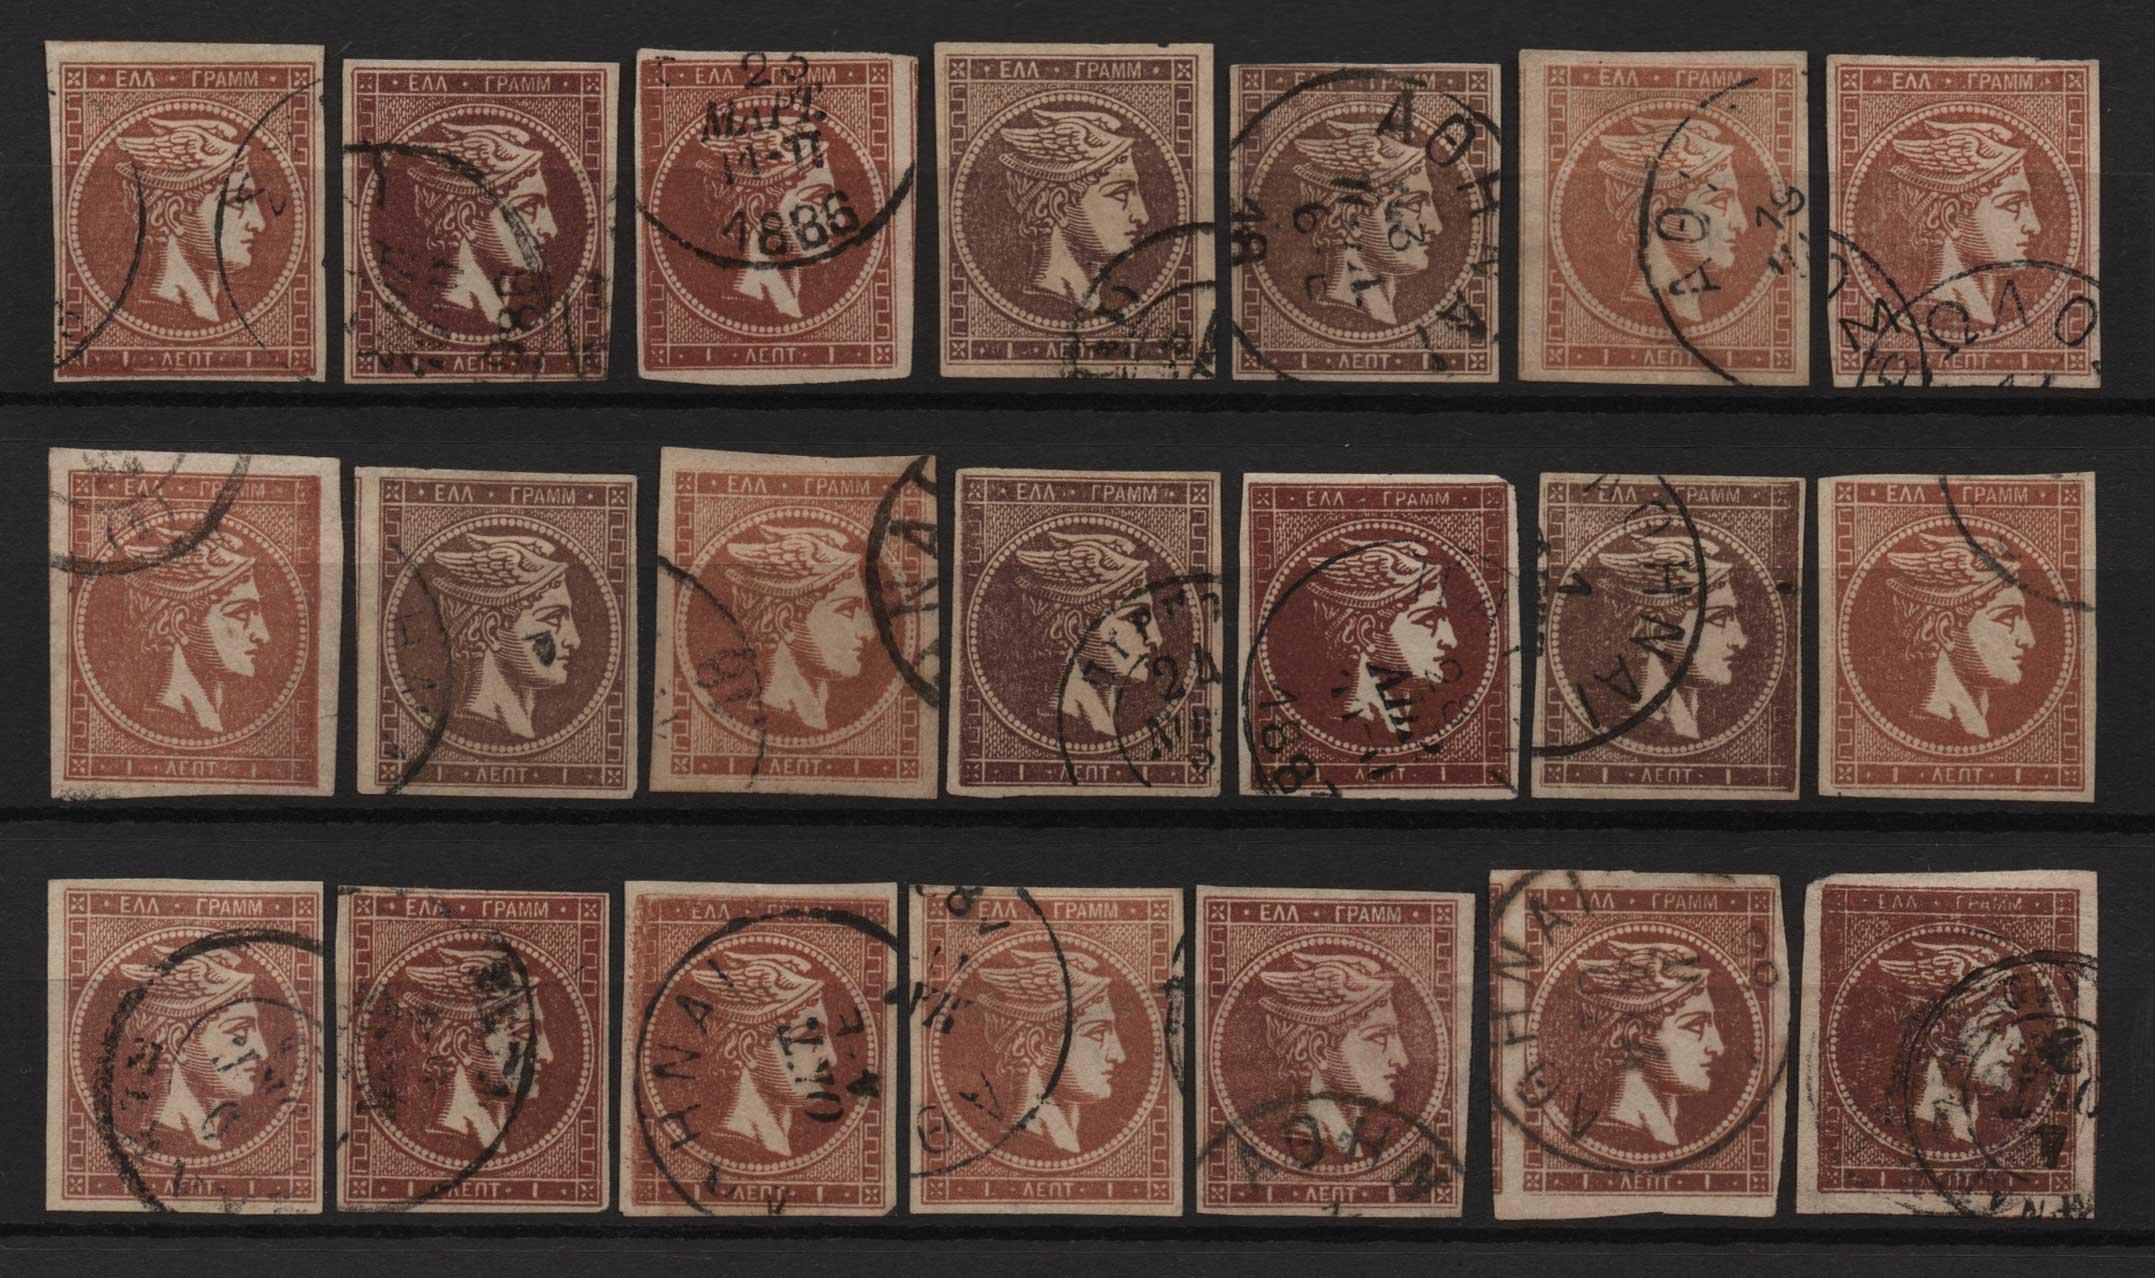 Lot 40 - -  LARGE HERMES HEAD large hermes head -  Athens Auctions Public Auction 76 General Stamp Sale